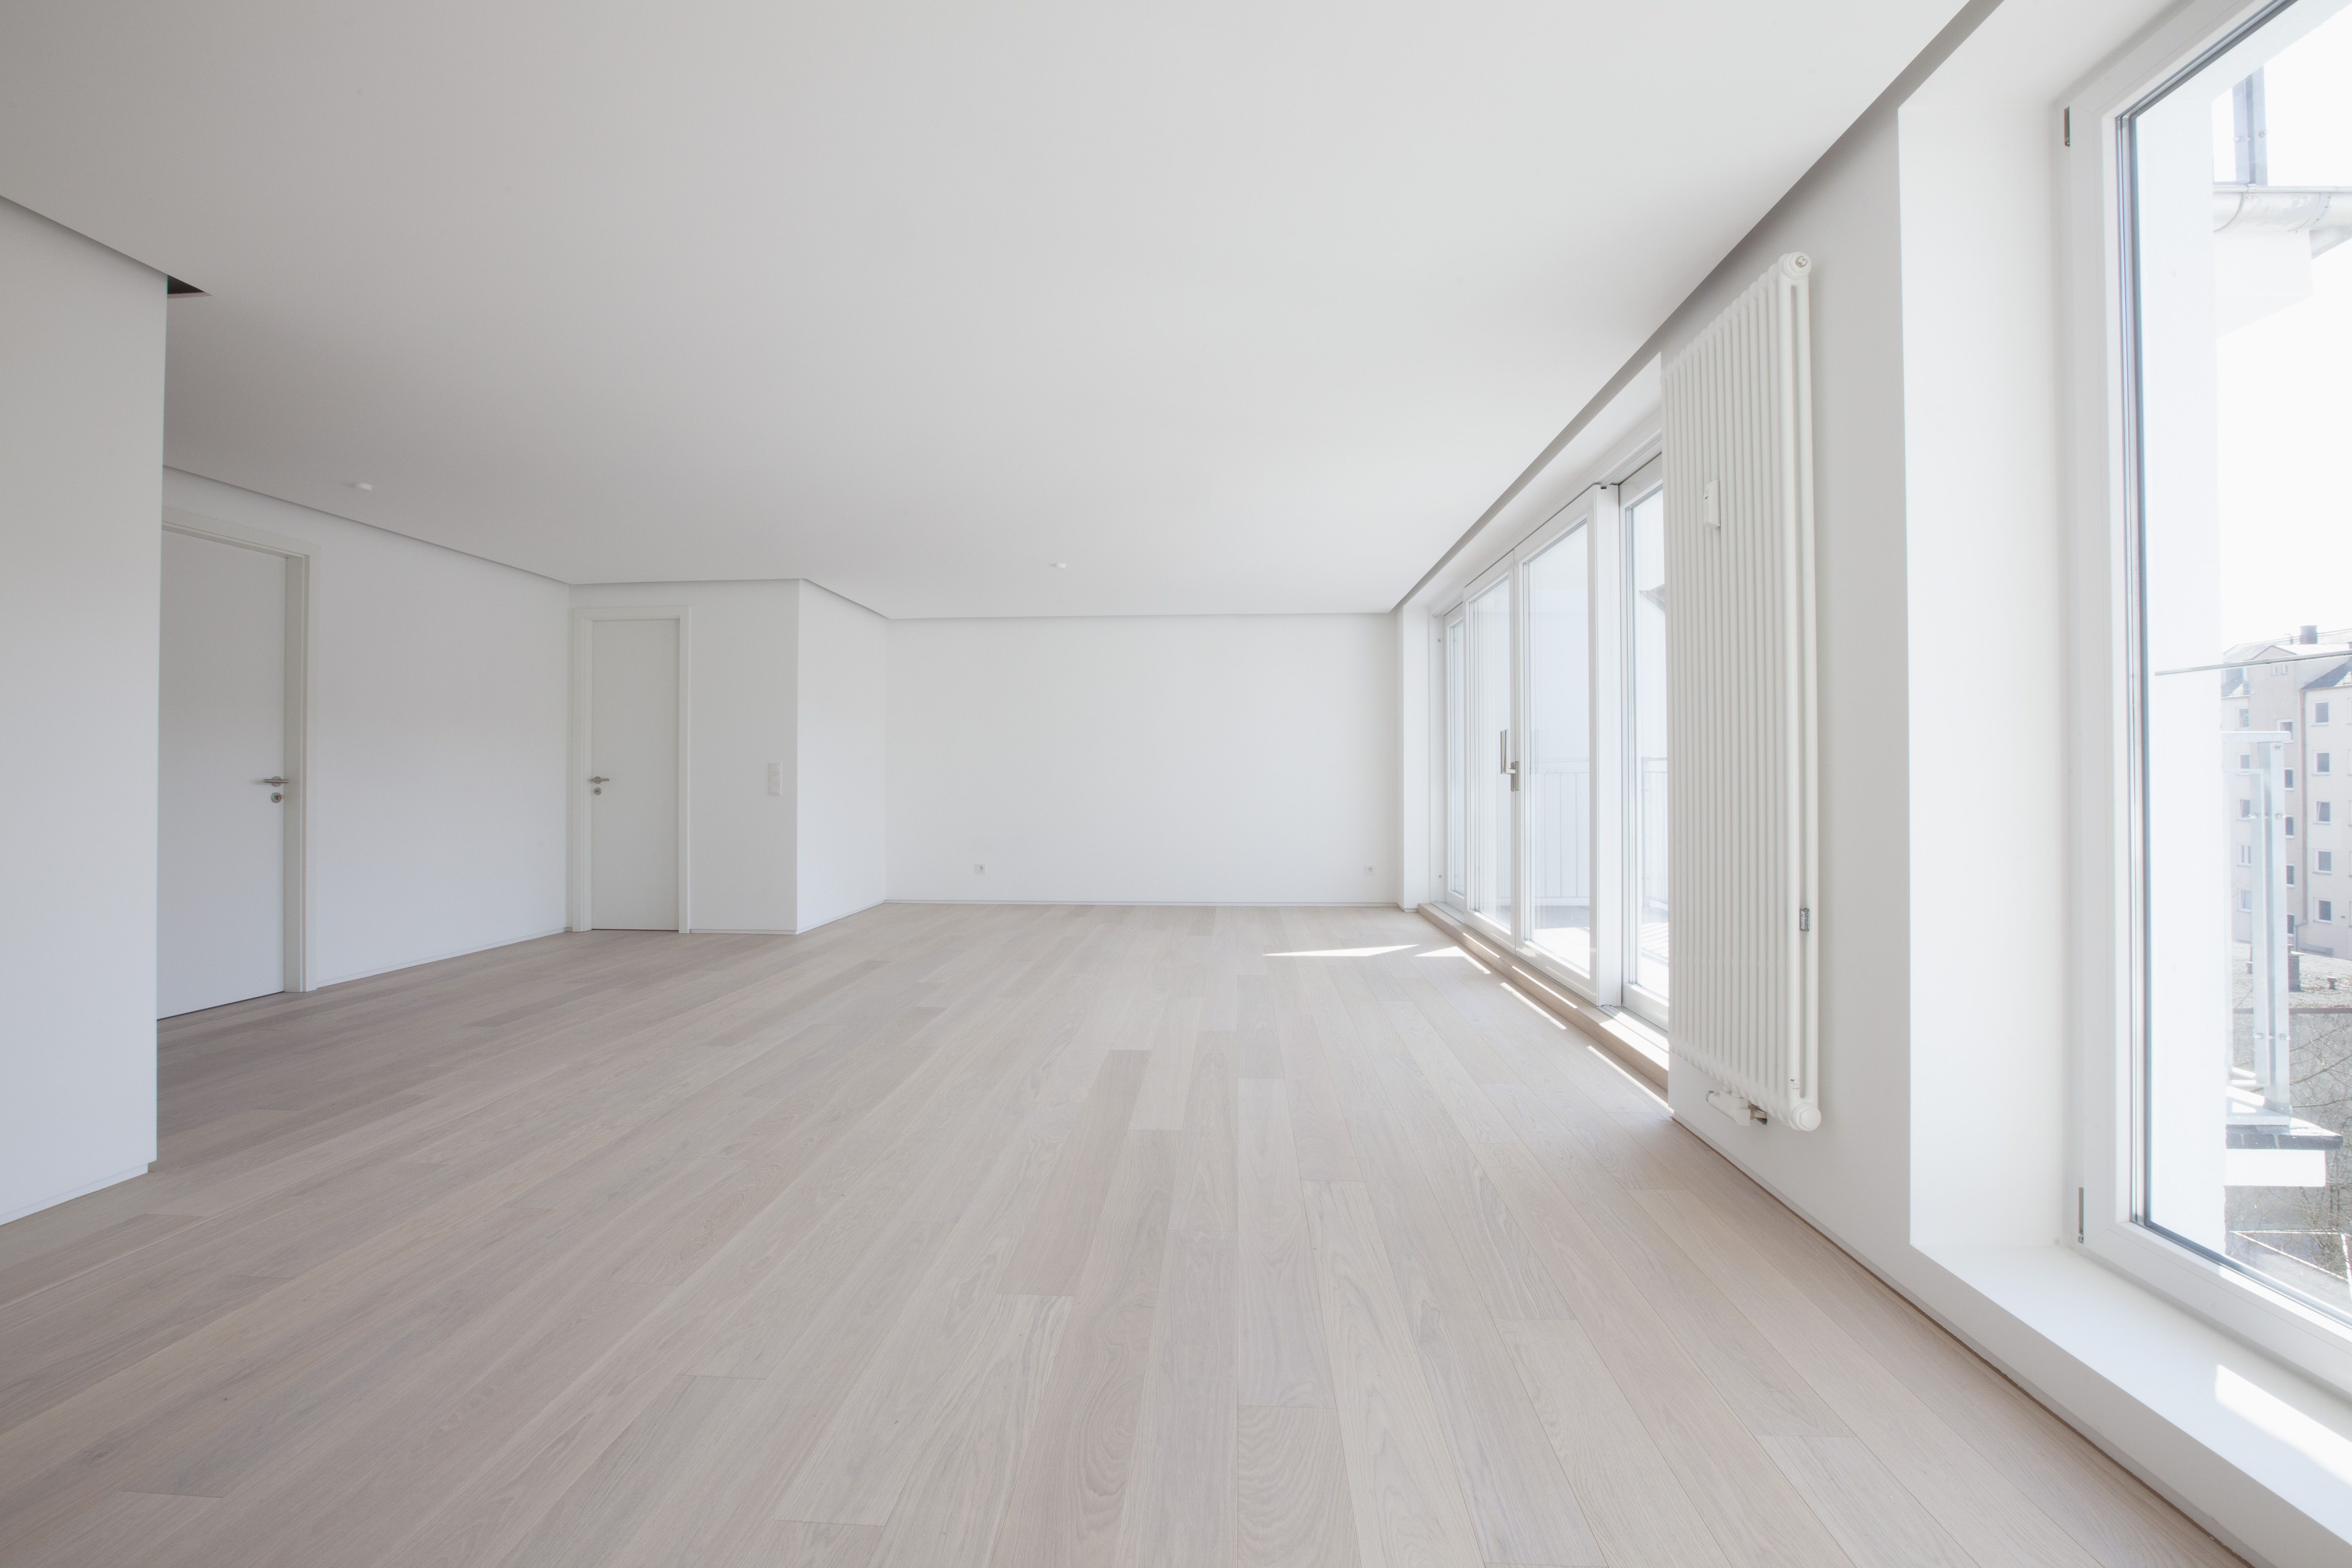 light colored engineered hardwood flooring of basics of favorite hybrid engineered wood floors pertaining to empty living room in modern apartment 578189139 58866f903df78c2ccdecab05